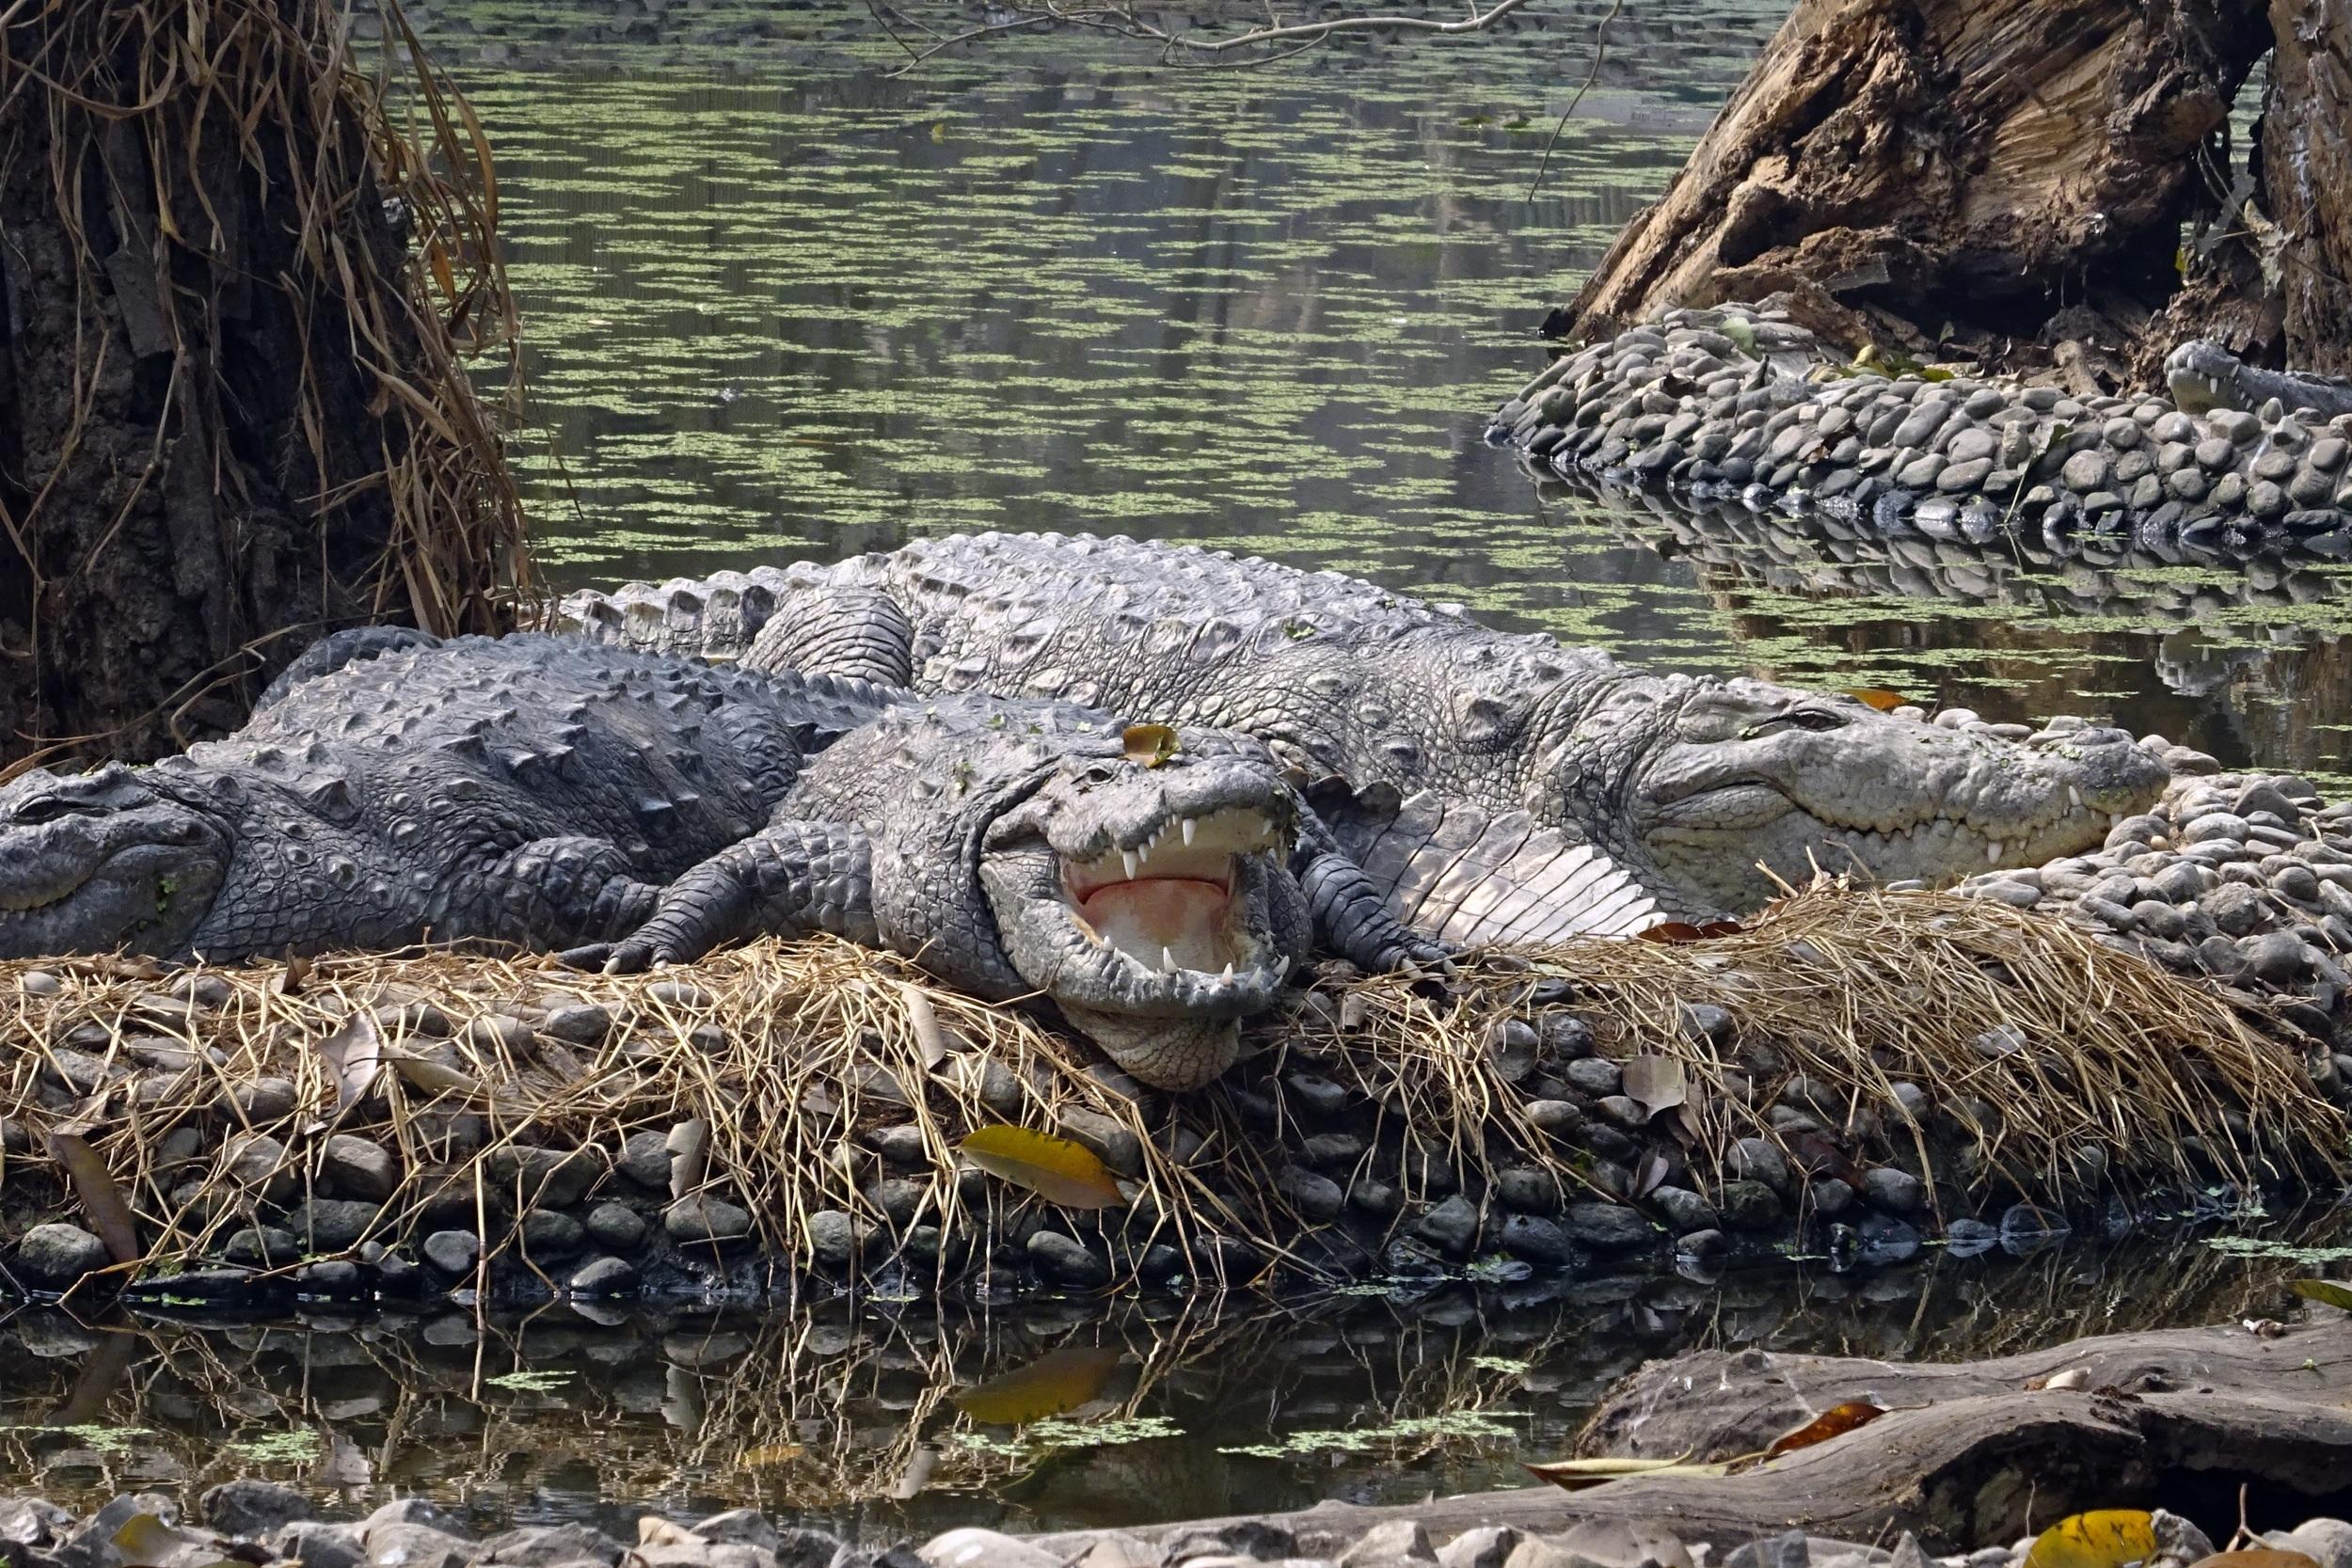 free images animal wildlife zoo reptile fauna alligator